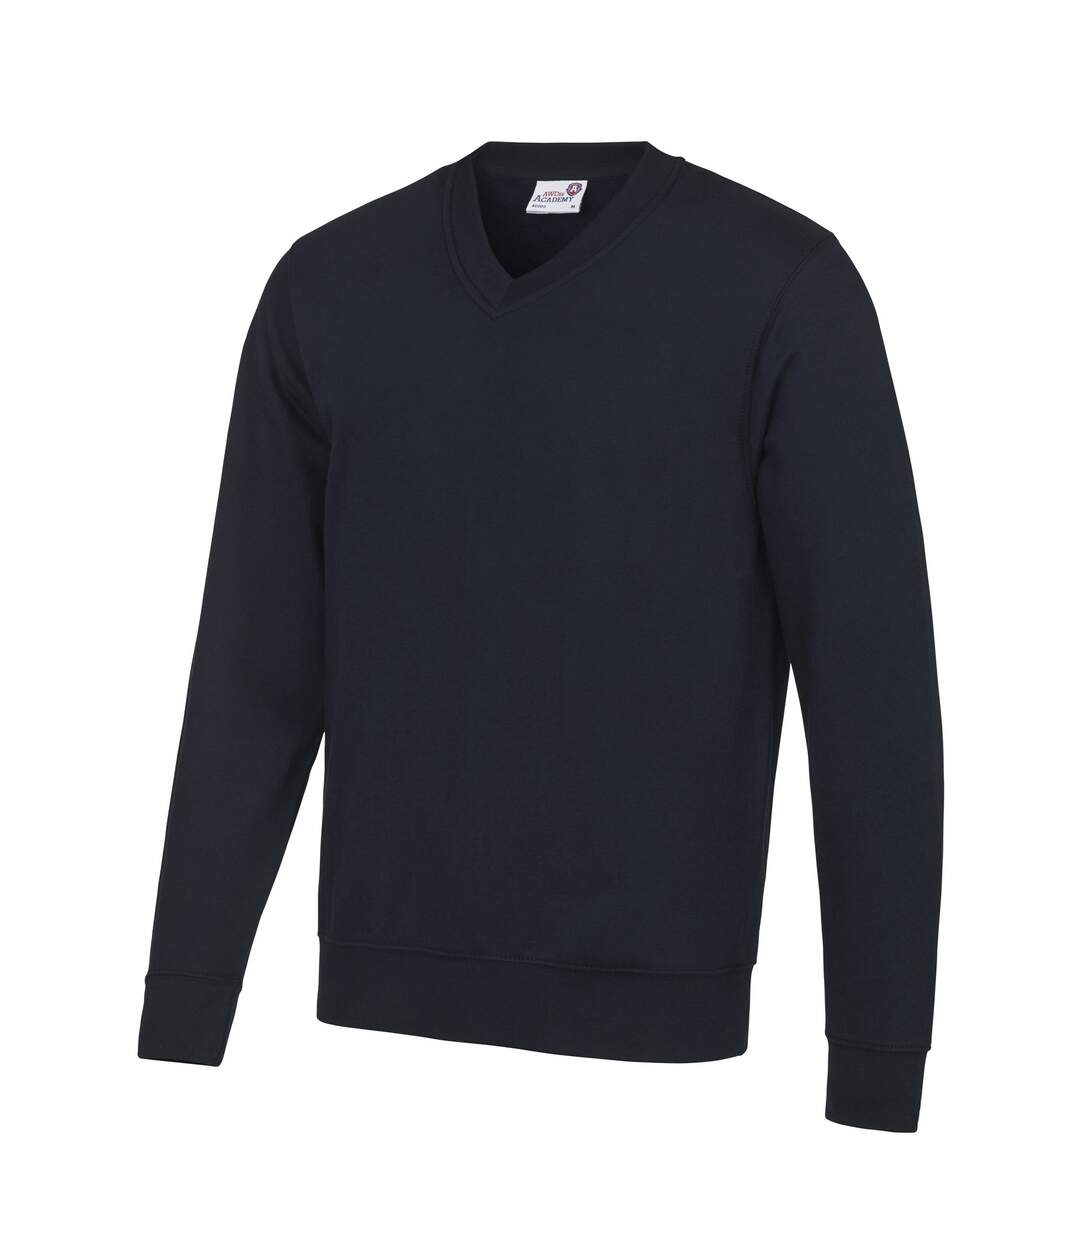 AWDis Academy Mens V Neck Jumper/Sweatshirt (Black) - UTRW3923